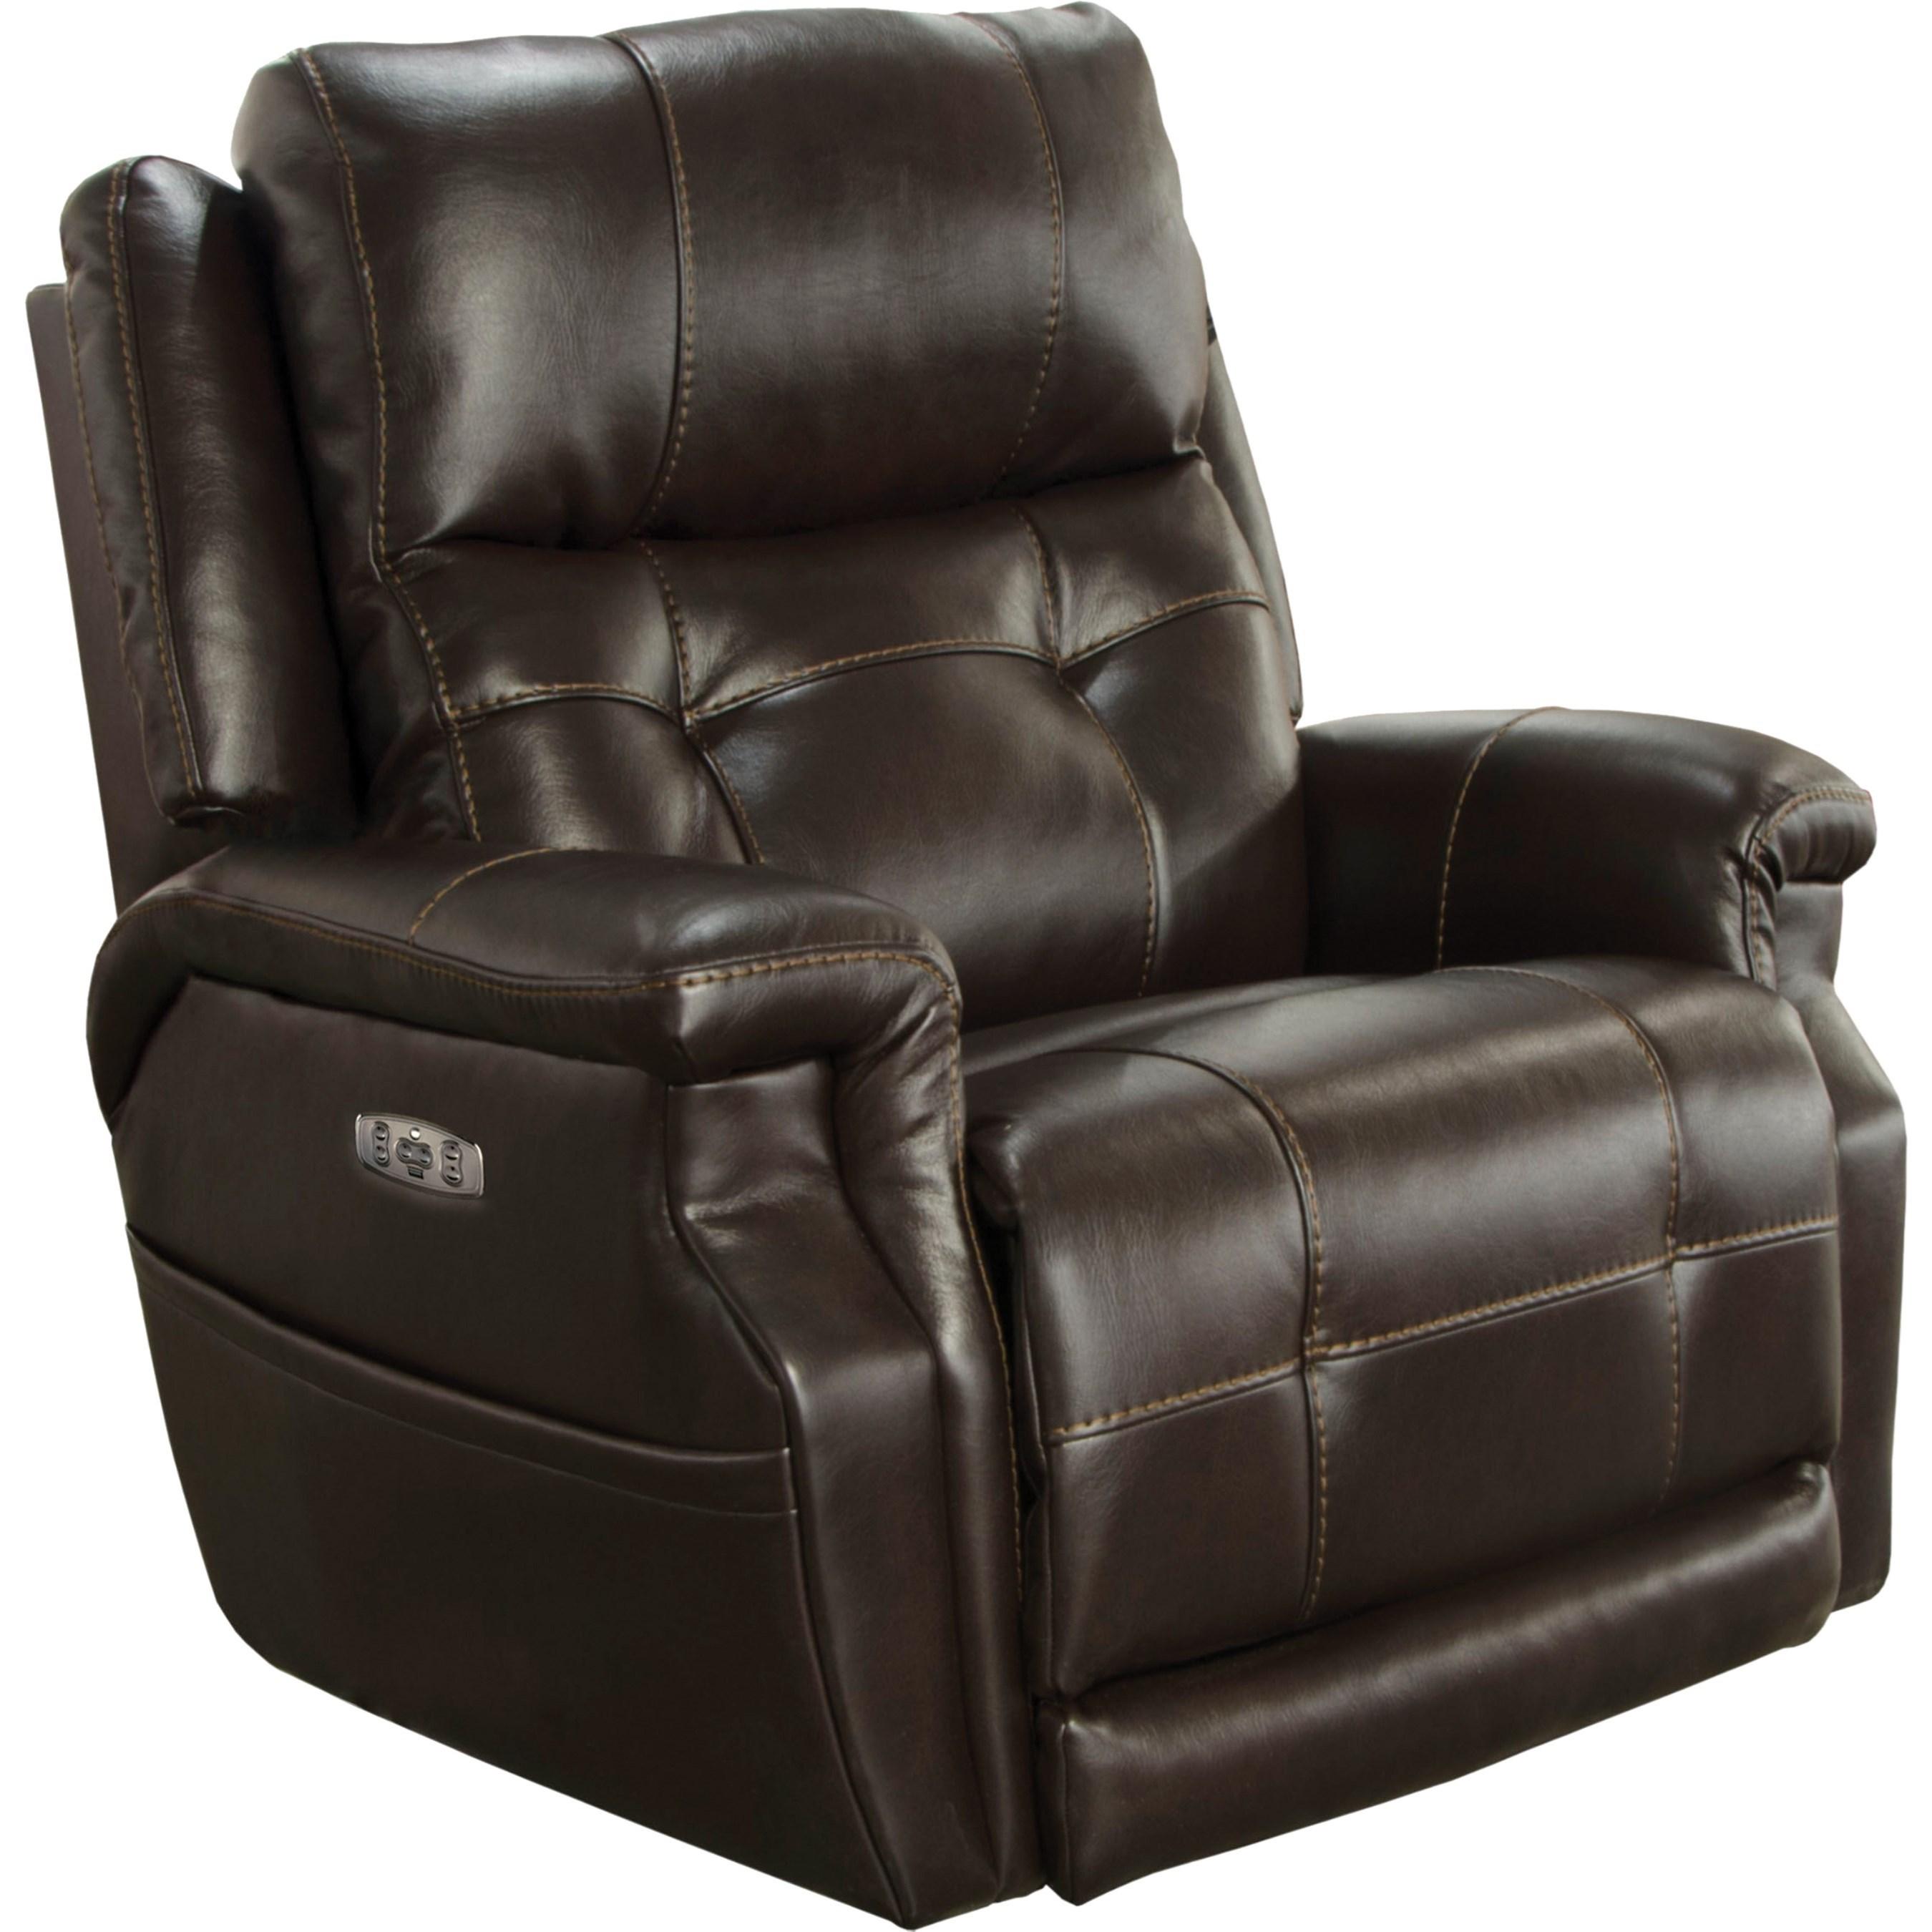 Pwr Headrest Lay Flat Recliner w/ Lumbar